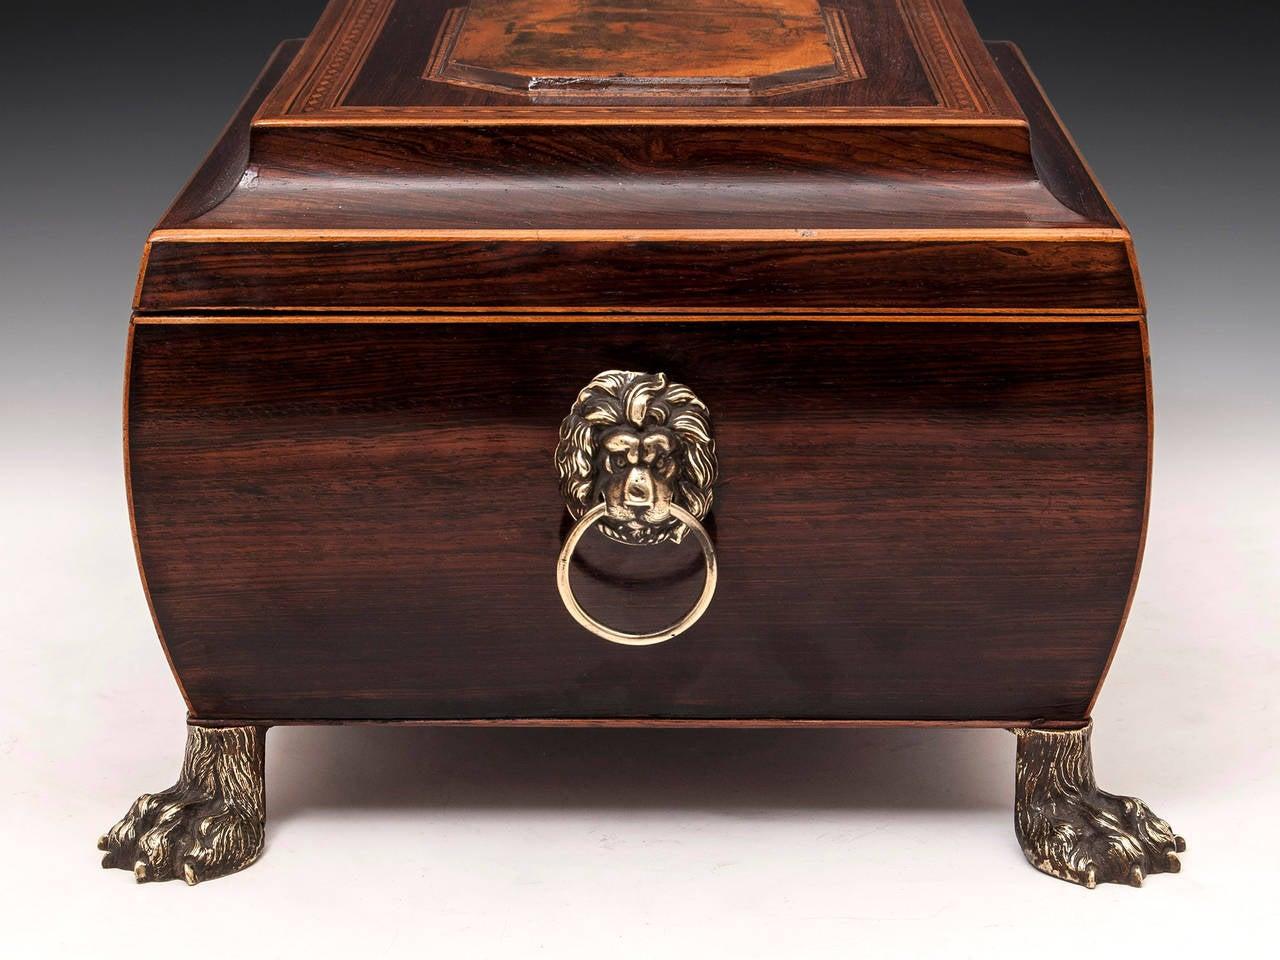 Brass 19th Century Regency Bombe Shape Mahogany Sewing Box For Sale